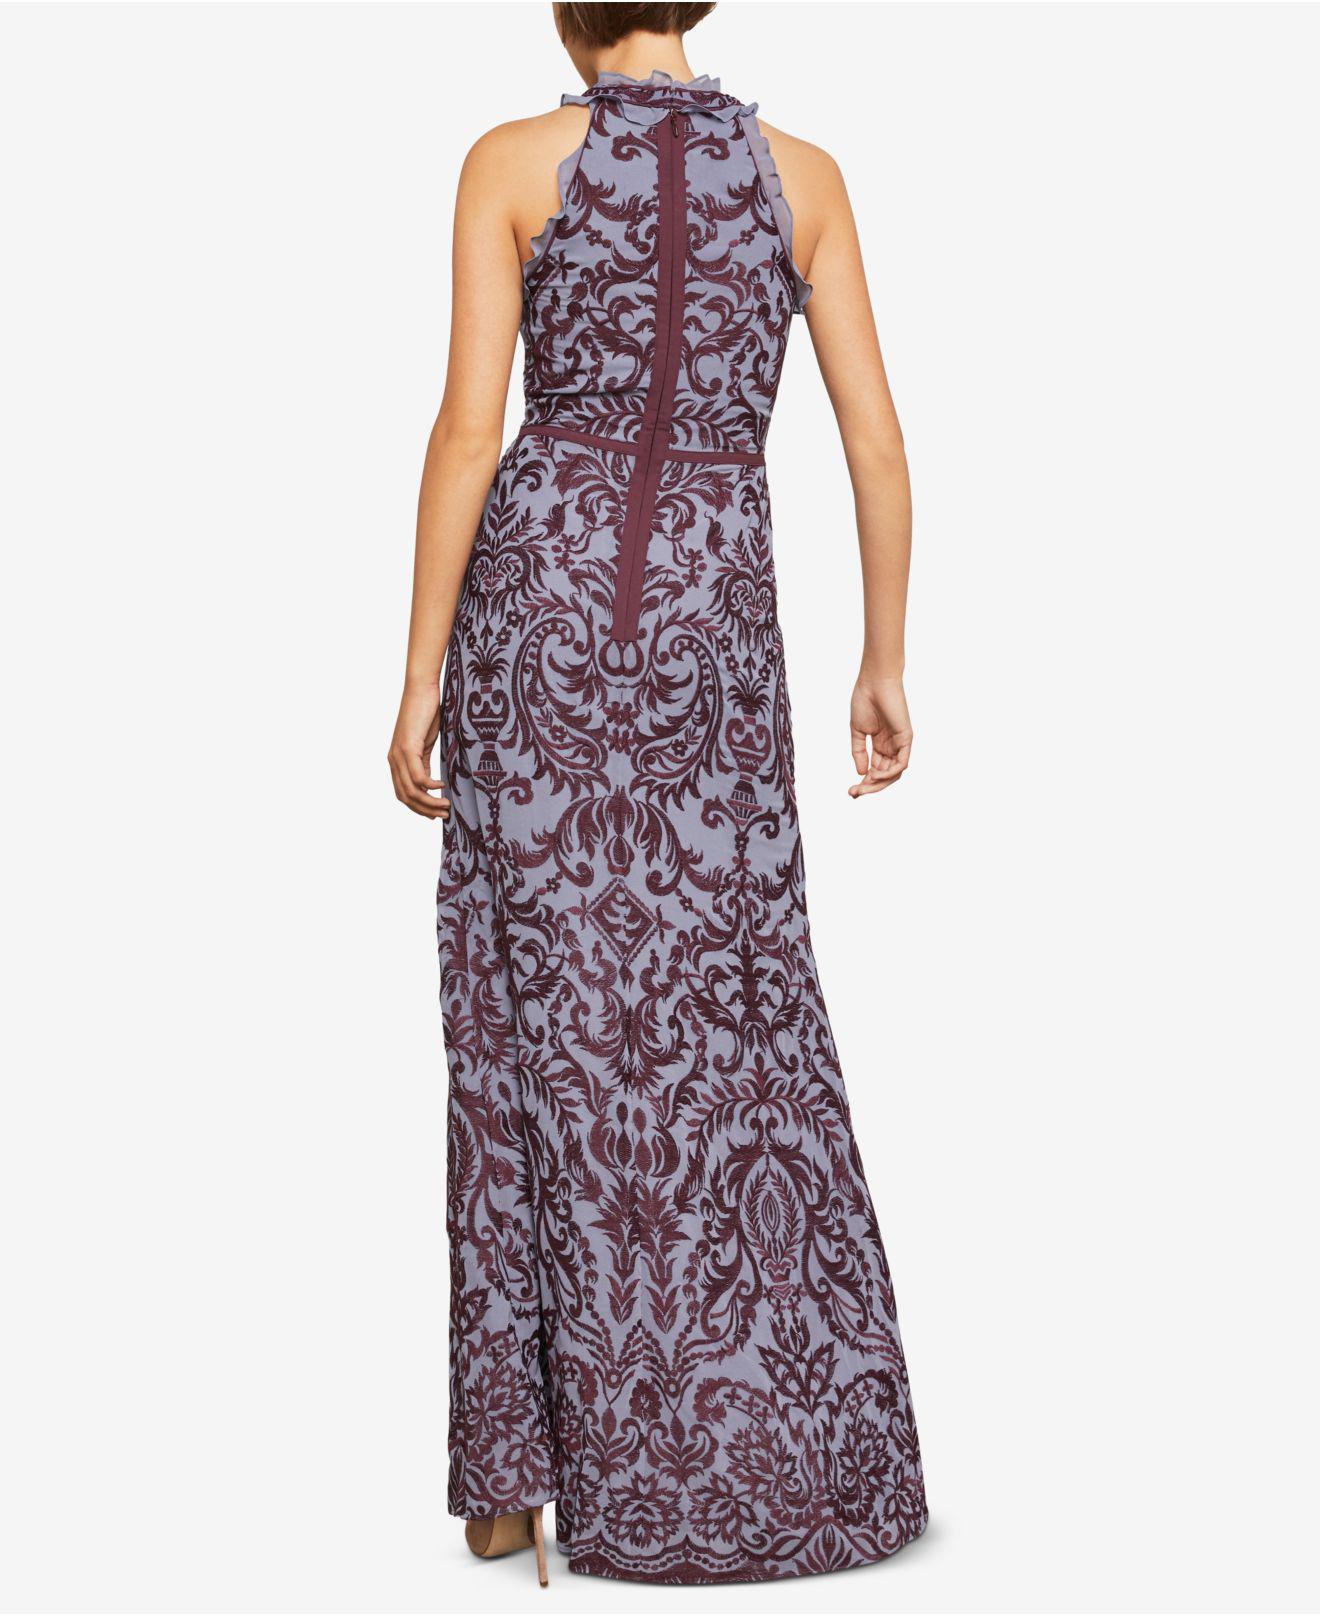 502ba061ed66 Lyst - BCBGMAXAZRIA Embroidered Chiffon Halter Gown in Purple